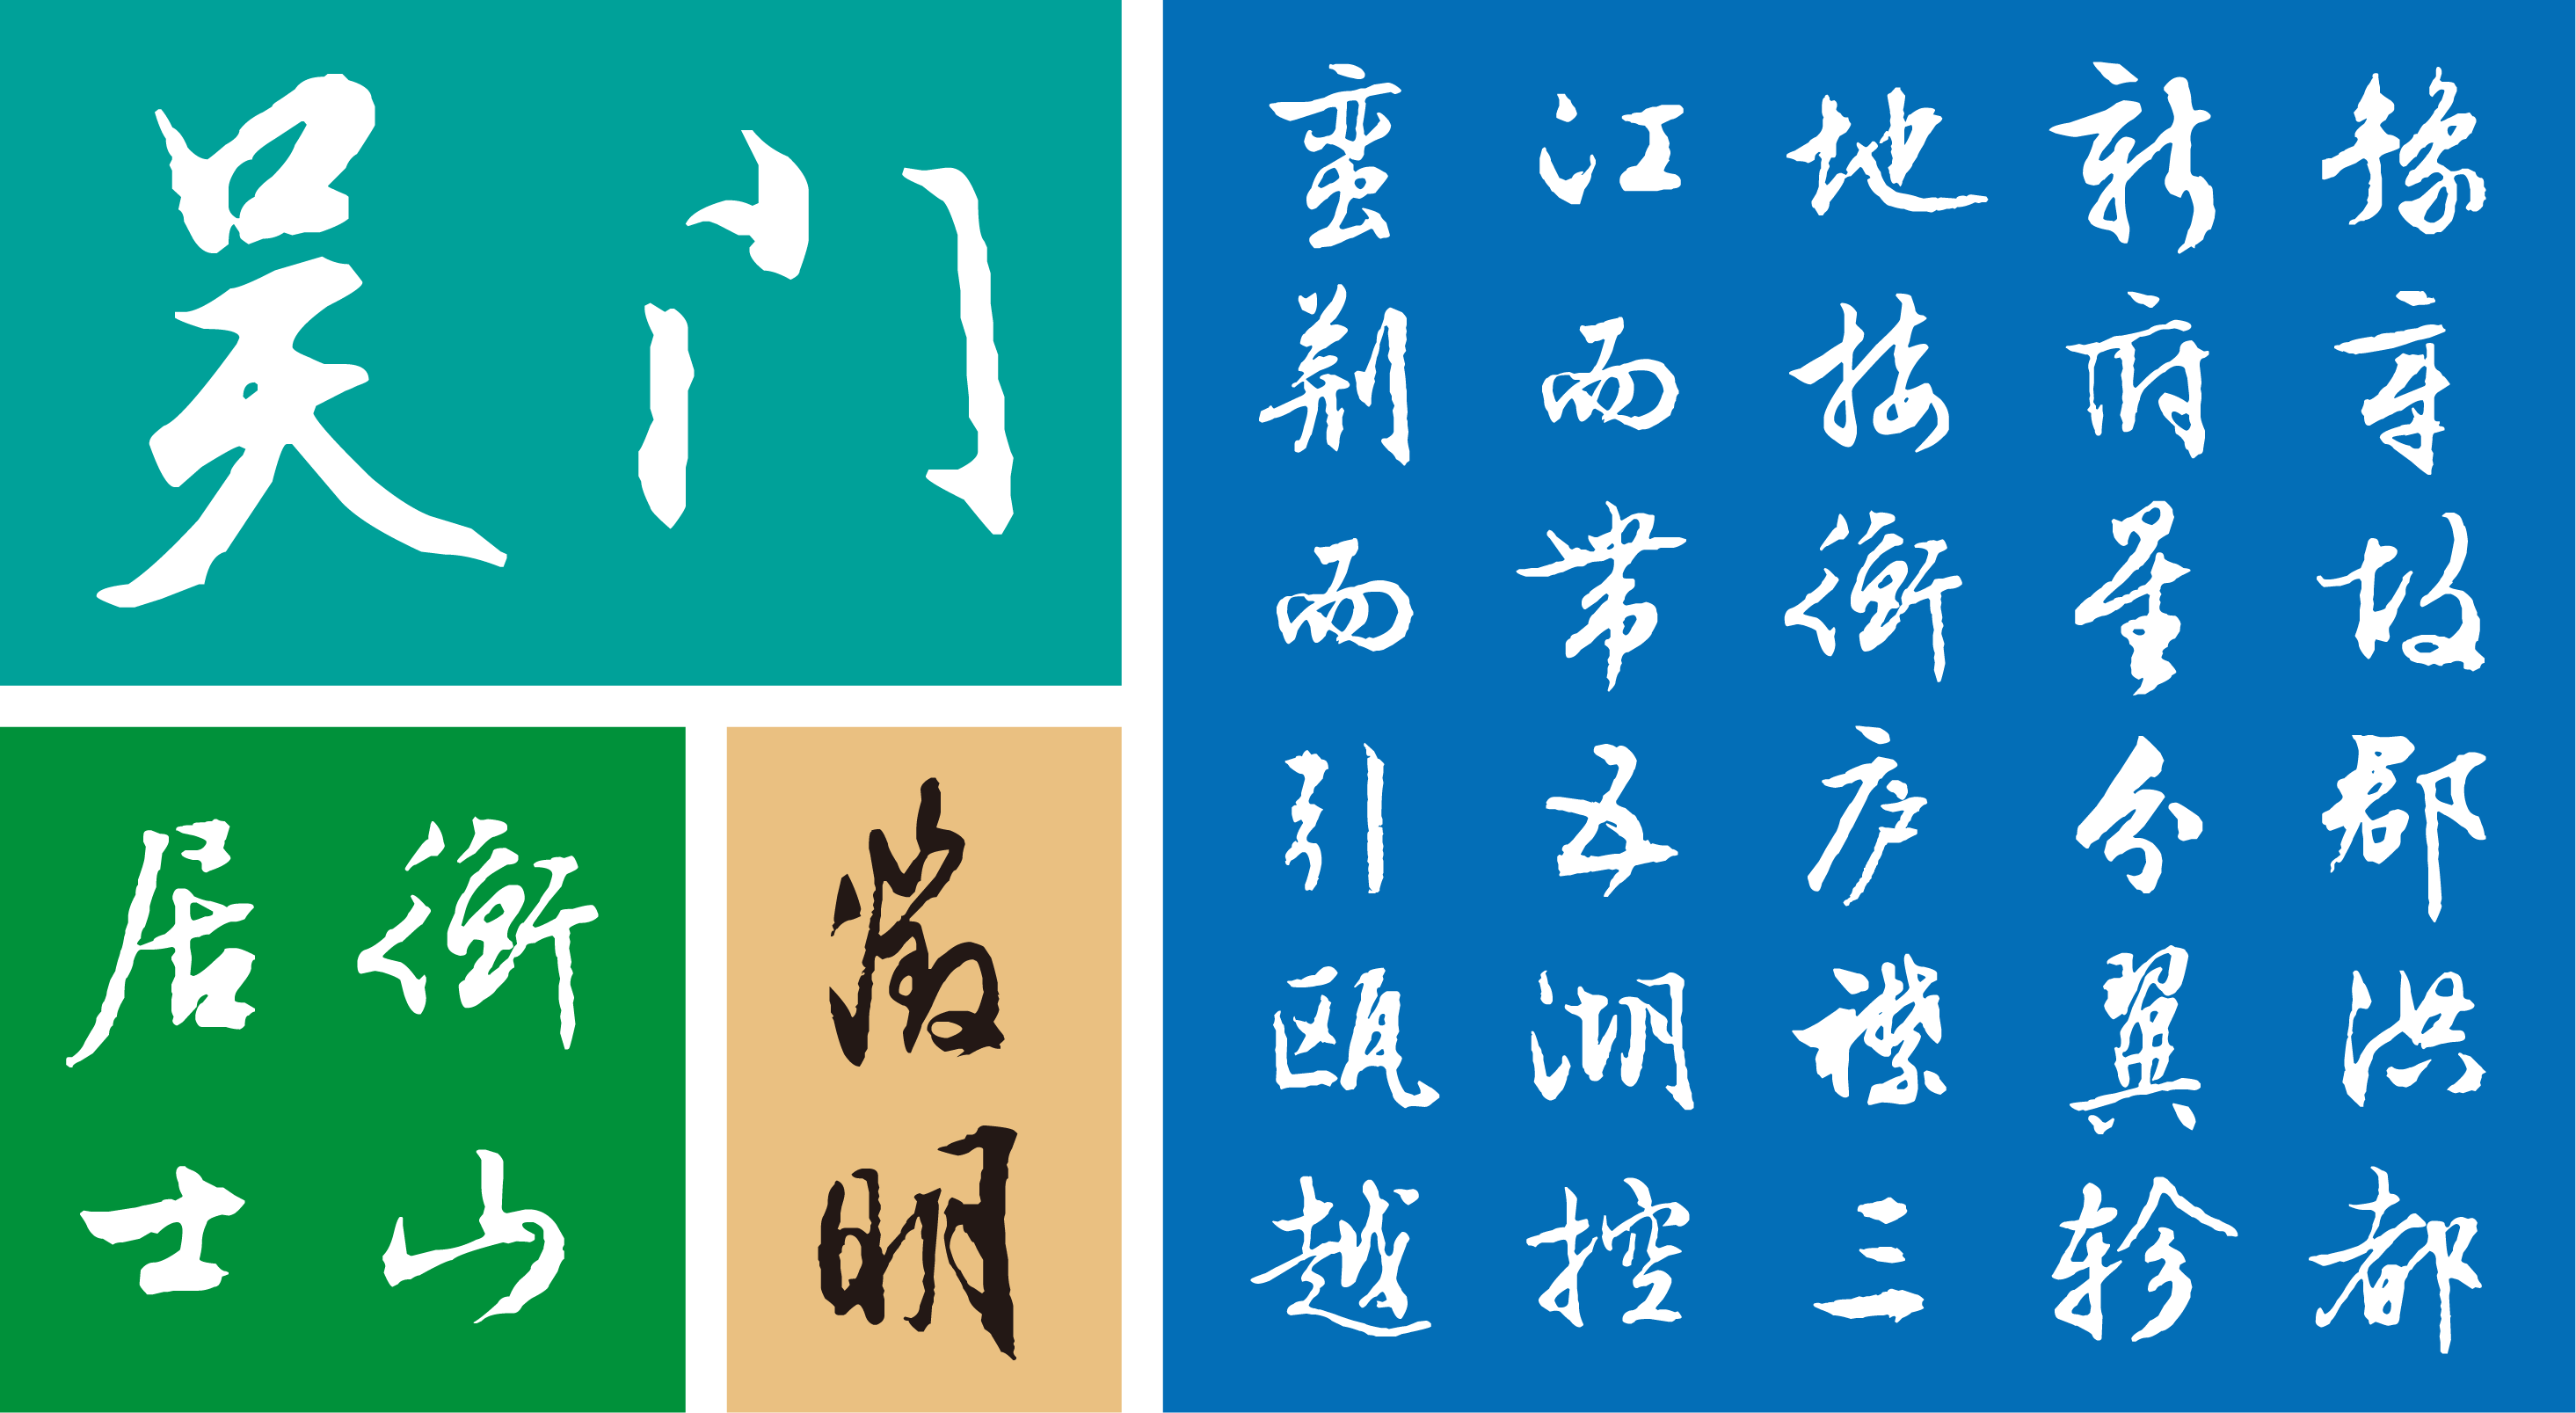 https://ft-bk1.oss-cn-zhangjiakou.aliyuncs.com/Public/Uploads/img/n_content_20201210174812_8880.png